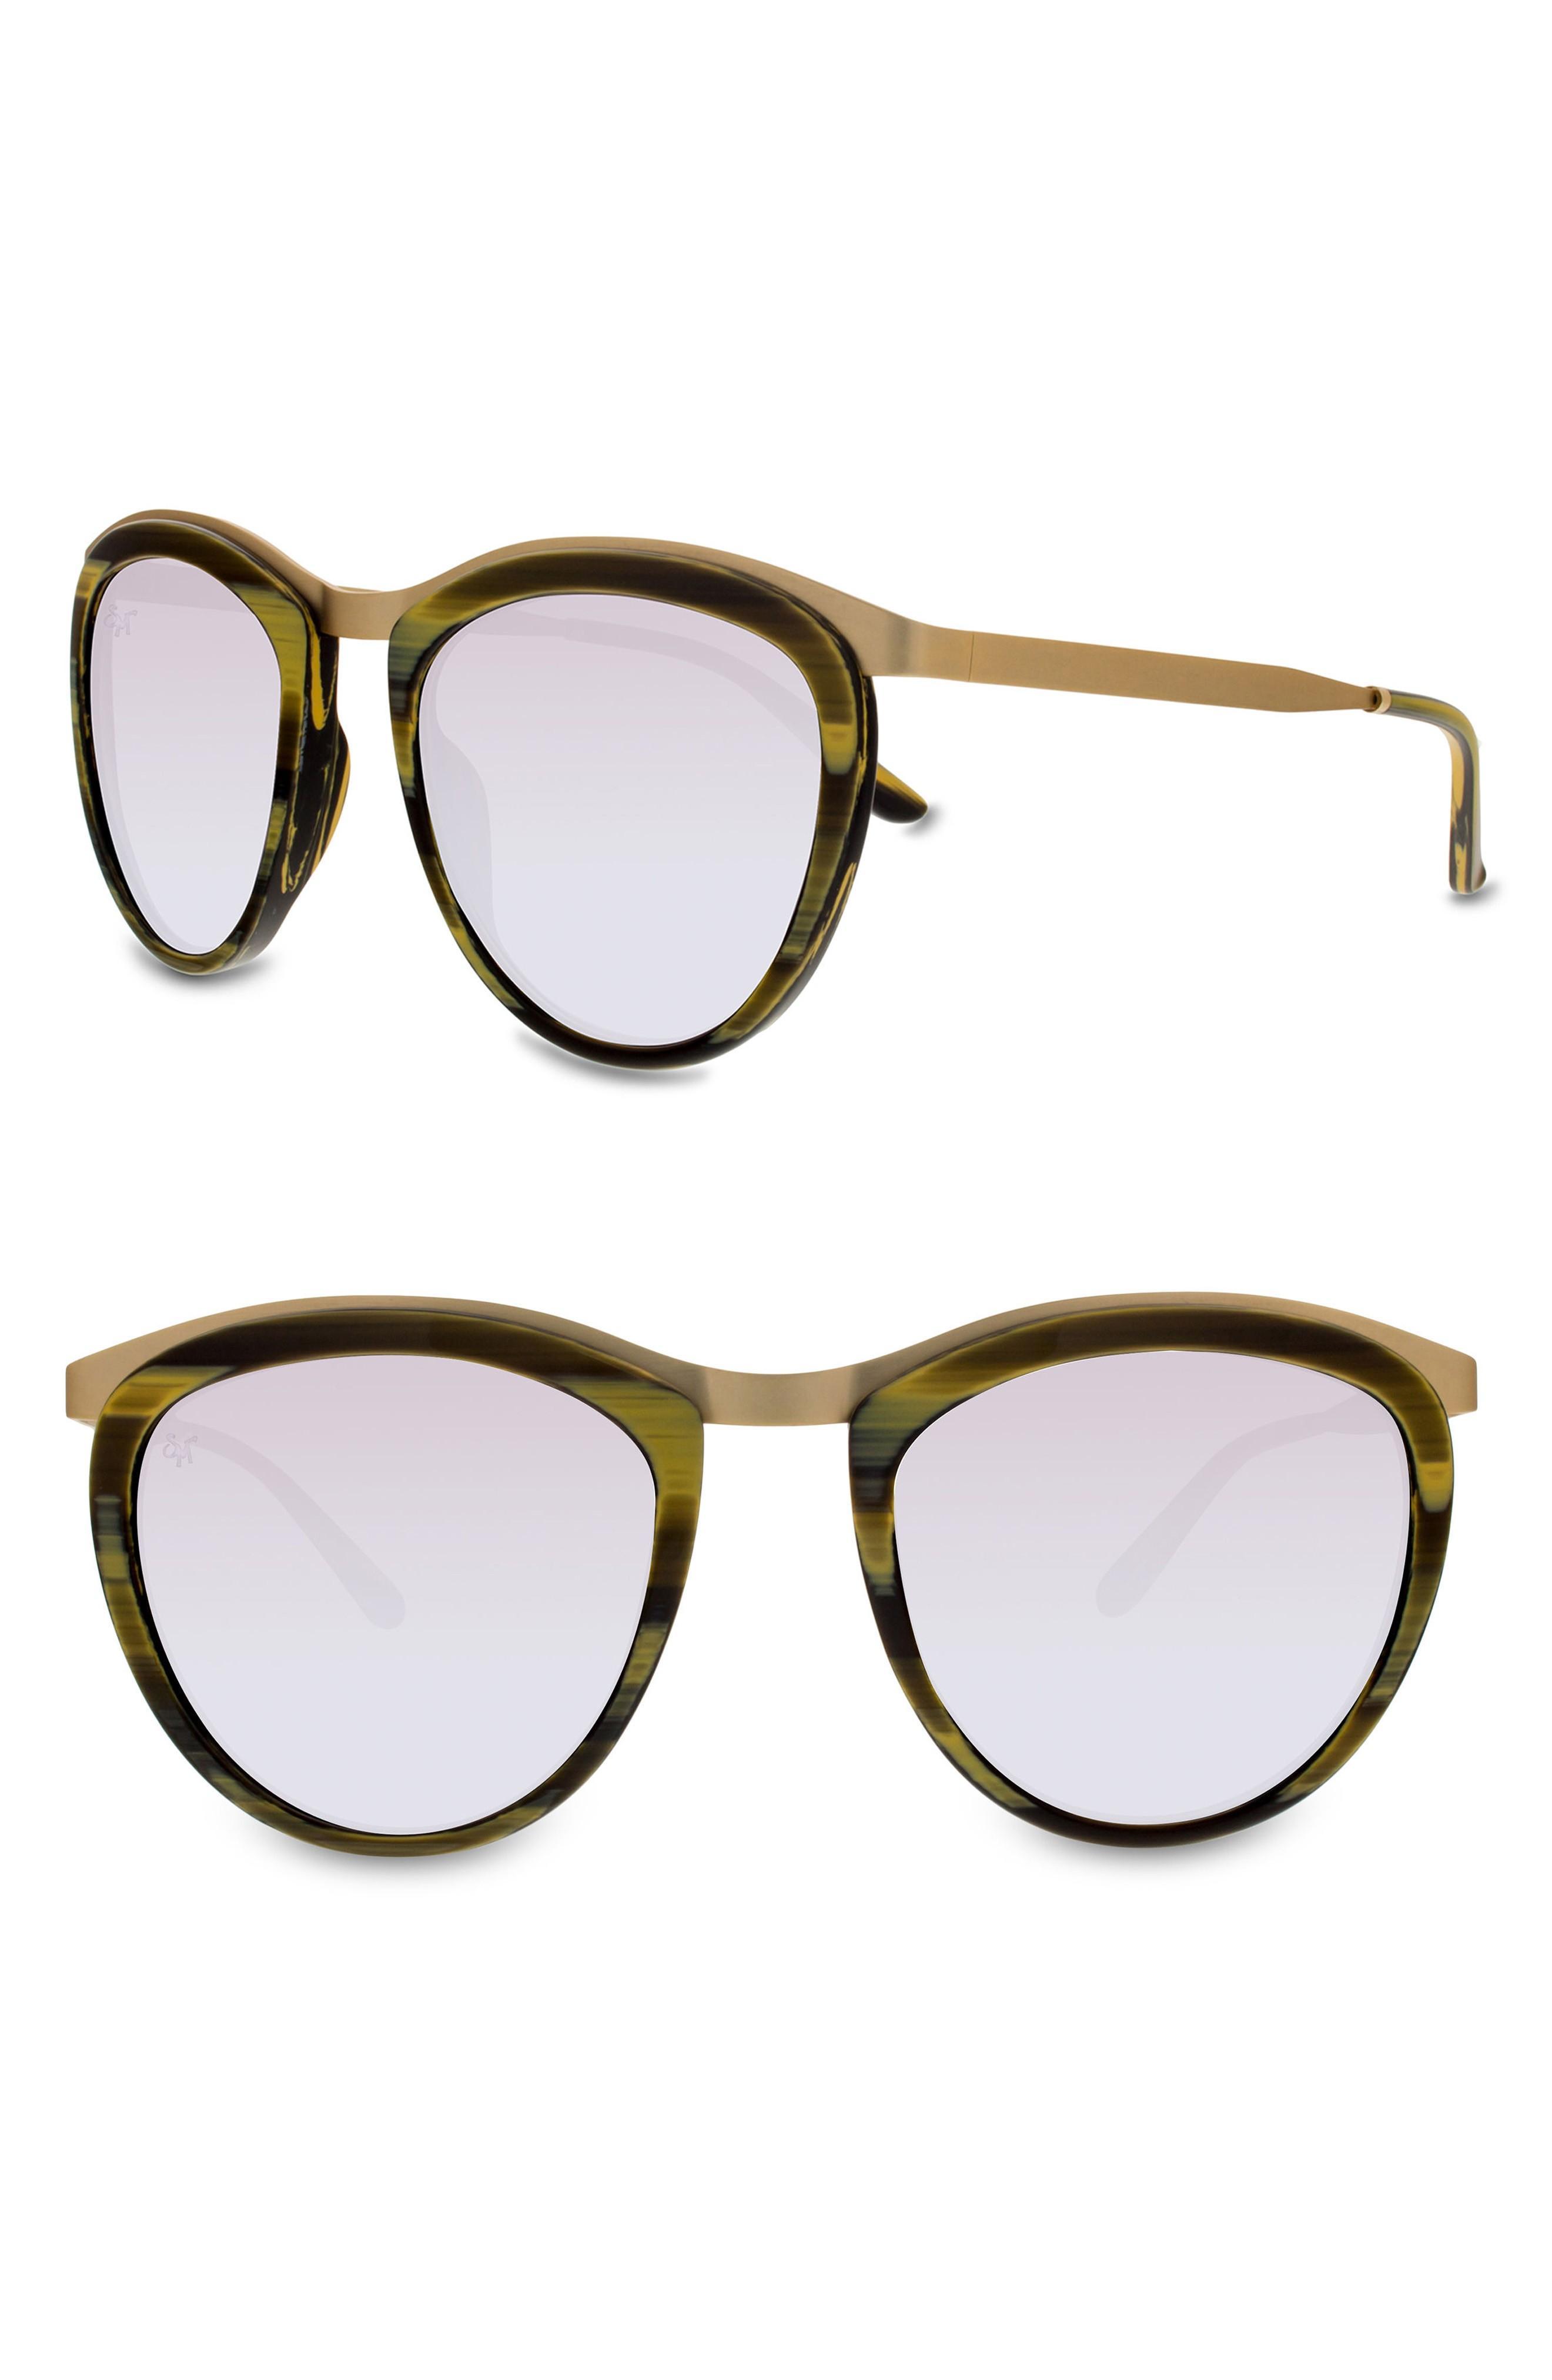 fe36130d09 Smoke X Mirrors Comic Strip 51Mm Round Sunglasses - Dark Horn  Gold  Silver  Mirror